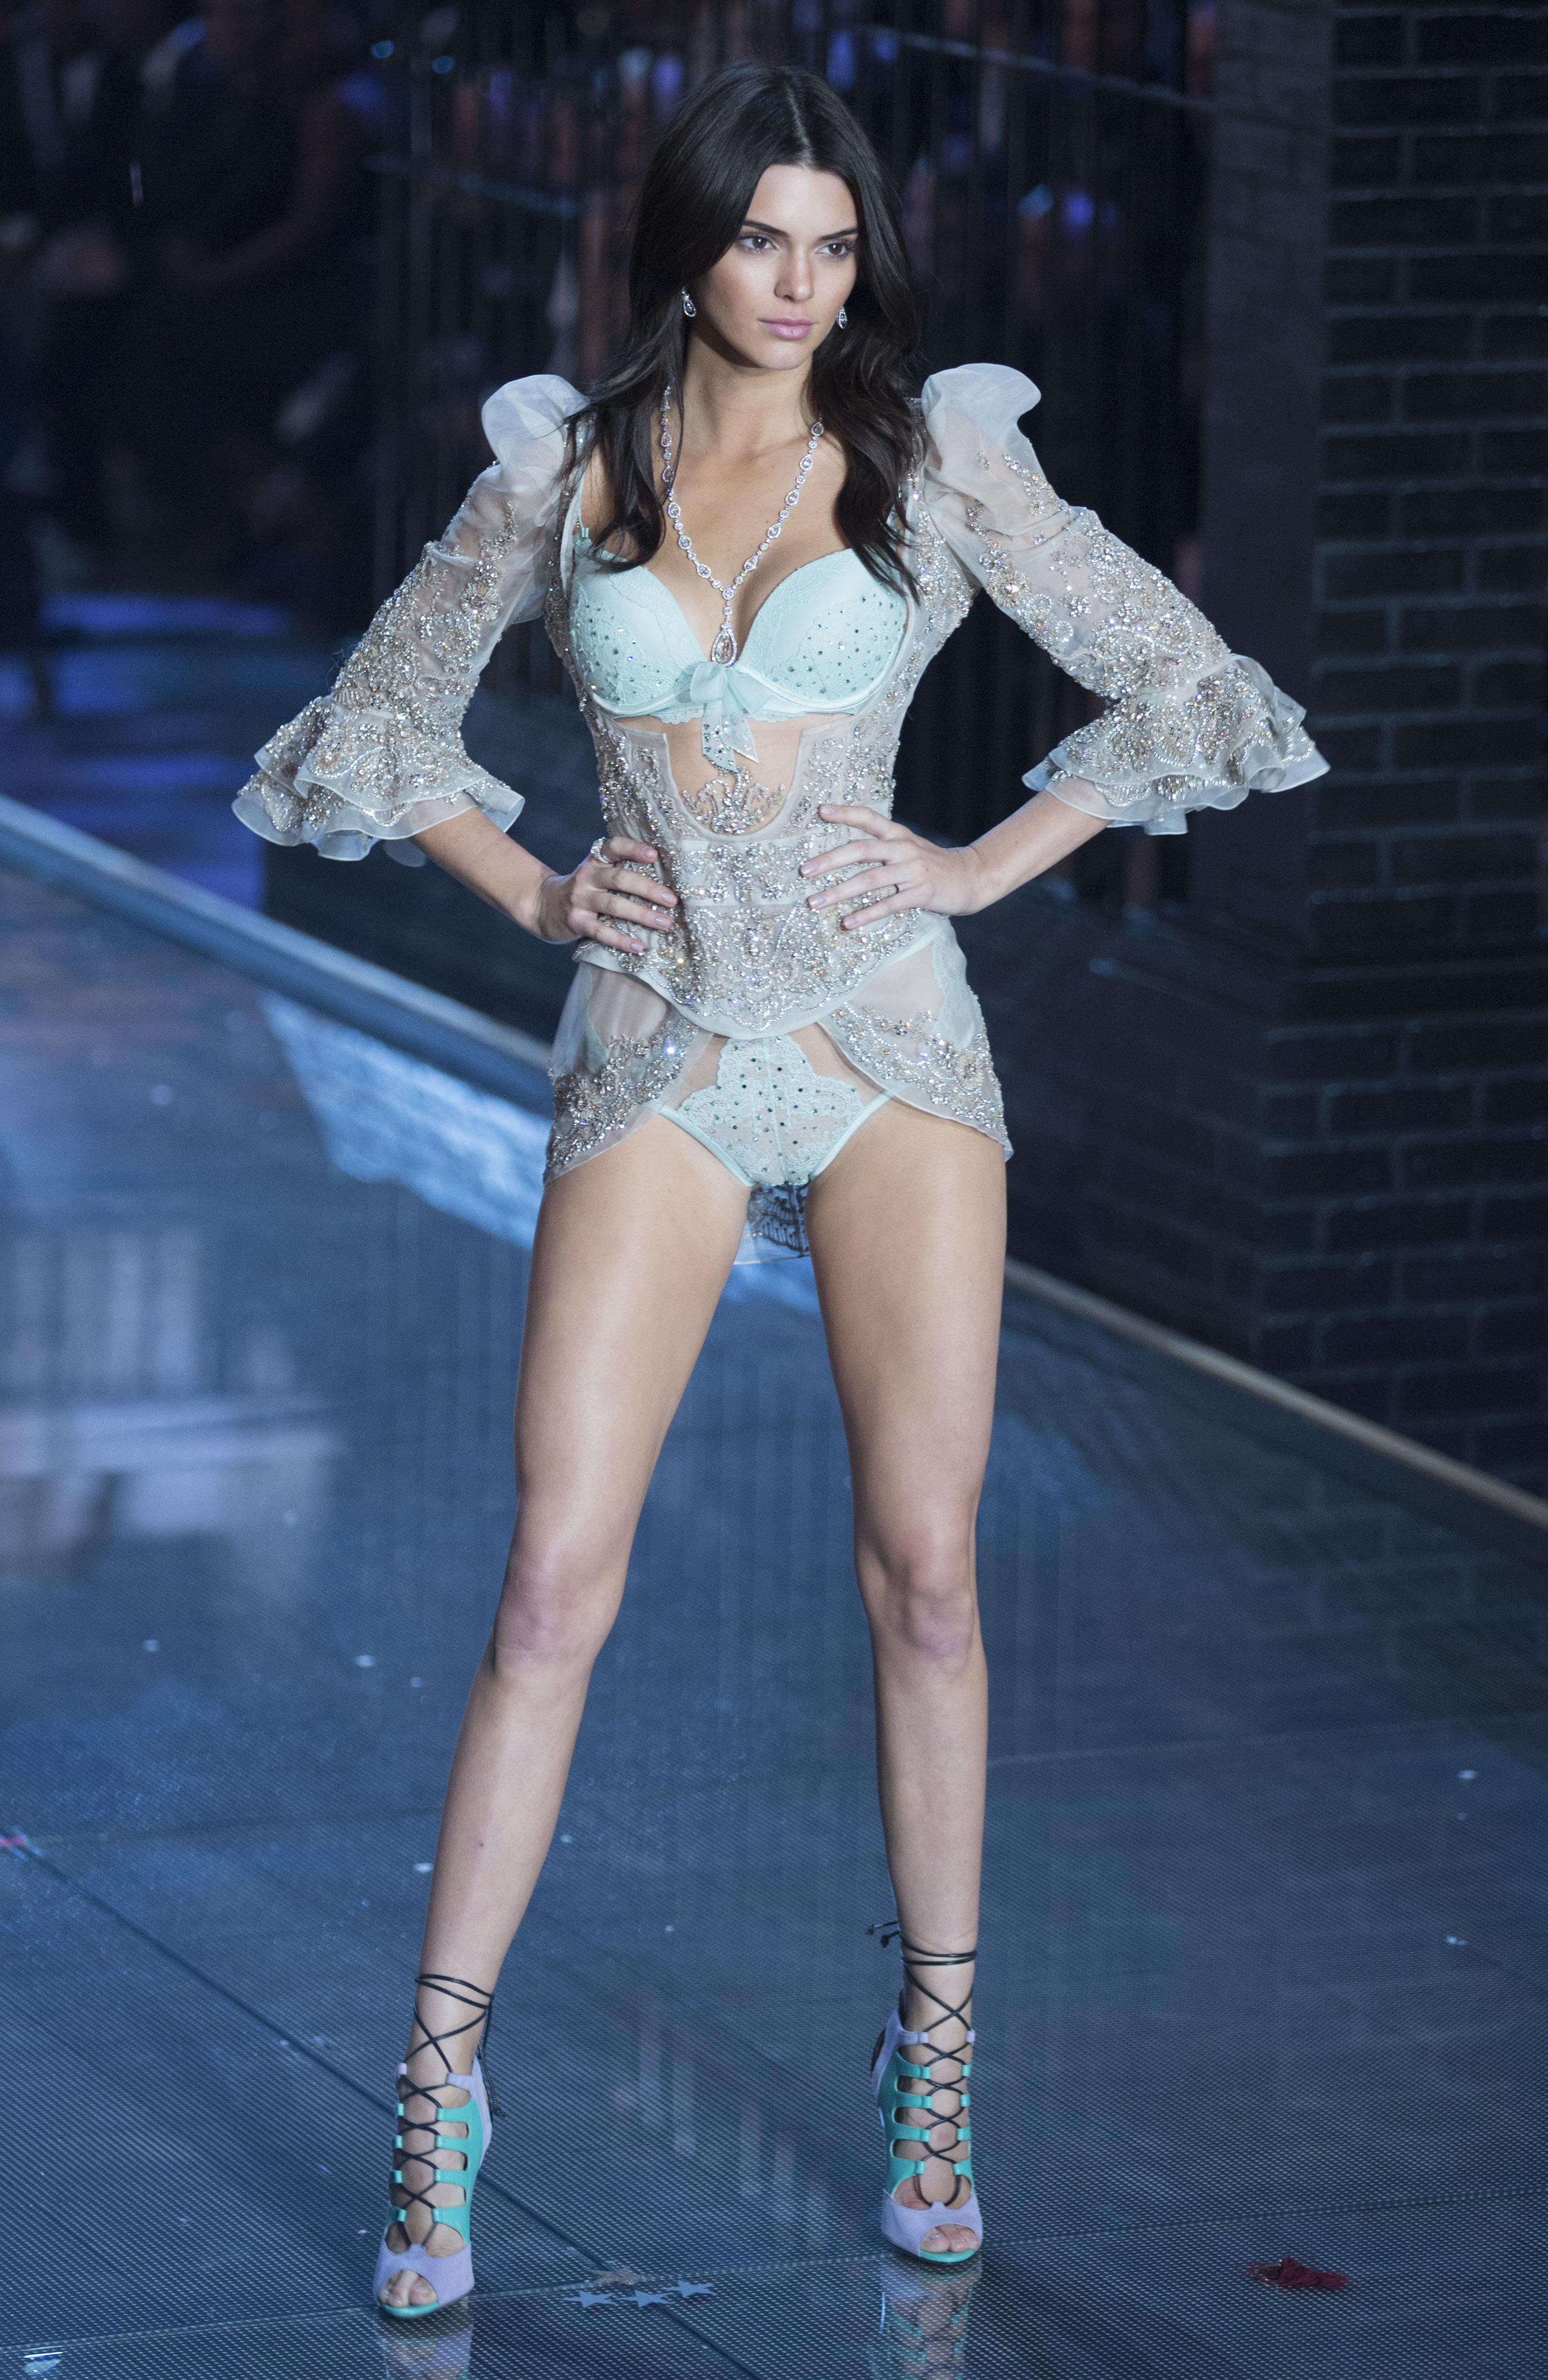 Kendall Jenner walks the 2015 Victoria's Secret runway